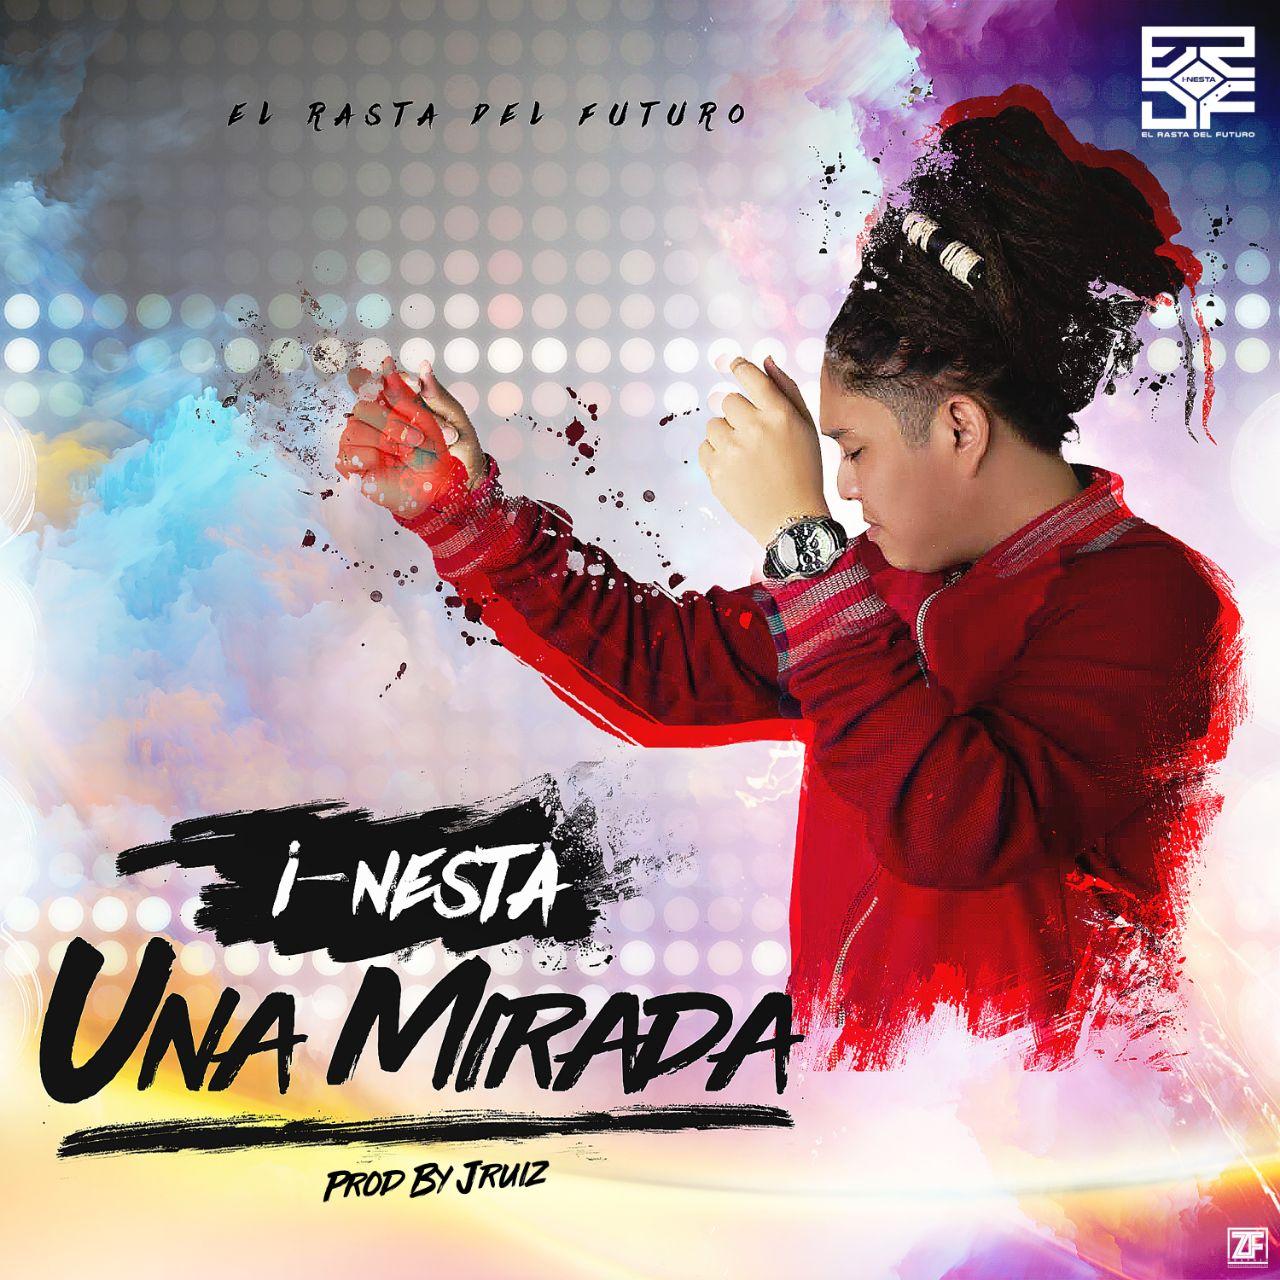 Photo of I Nesta estrena su nuevo single 'Una Mirada'